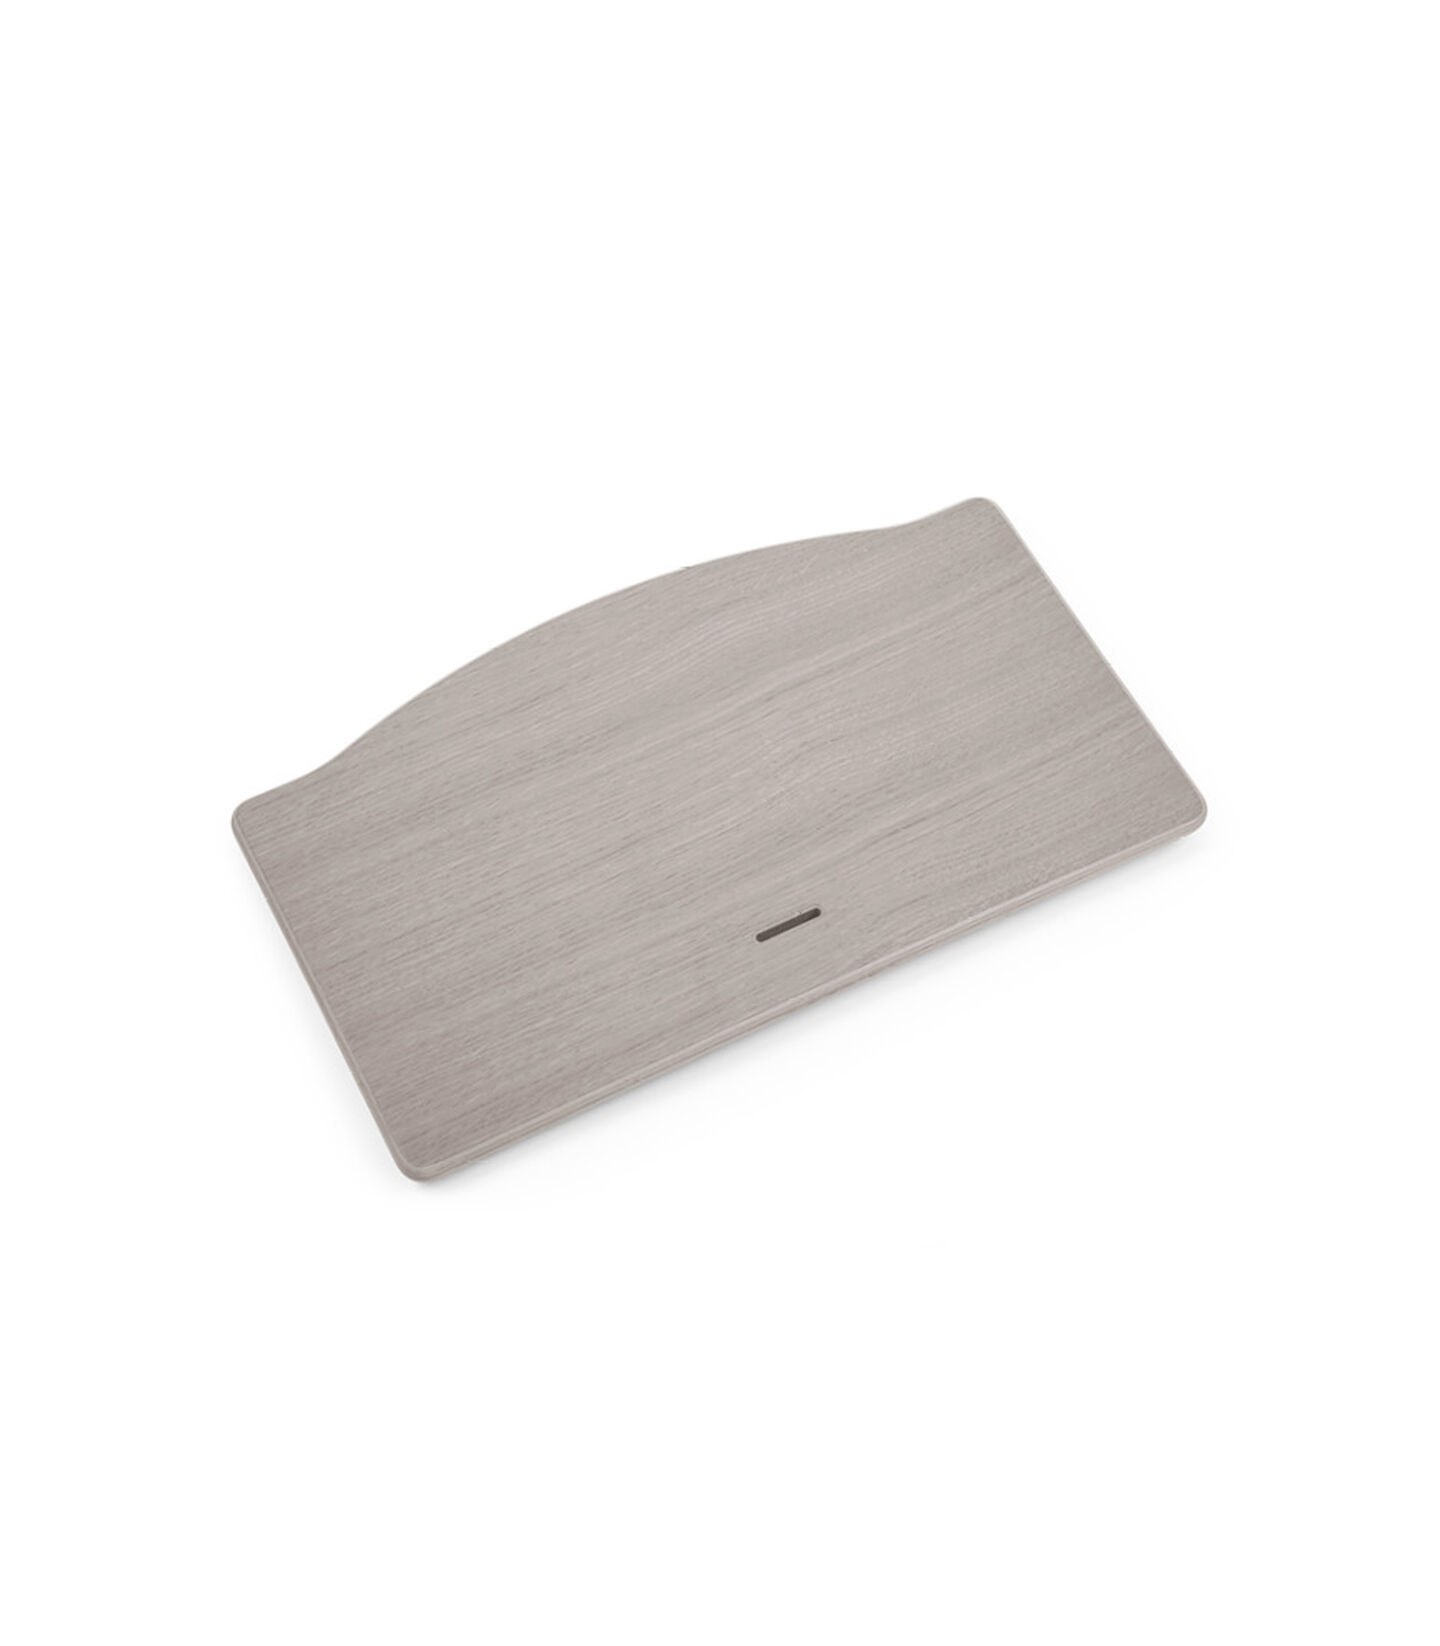 Tripp Trapp® Seatplate Oak Greywash, Oak Grey, mainview view 1